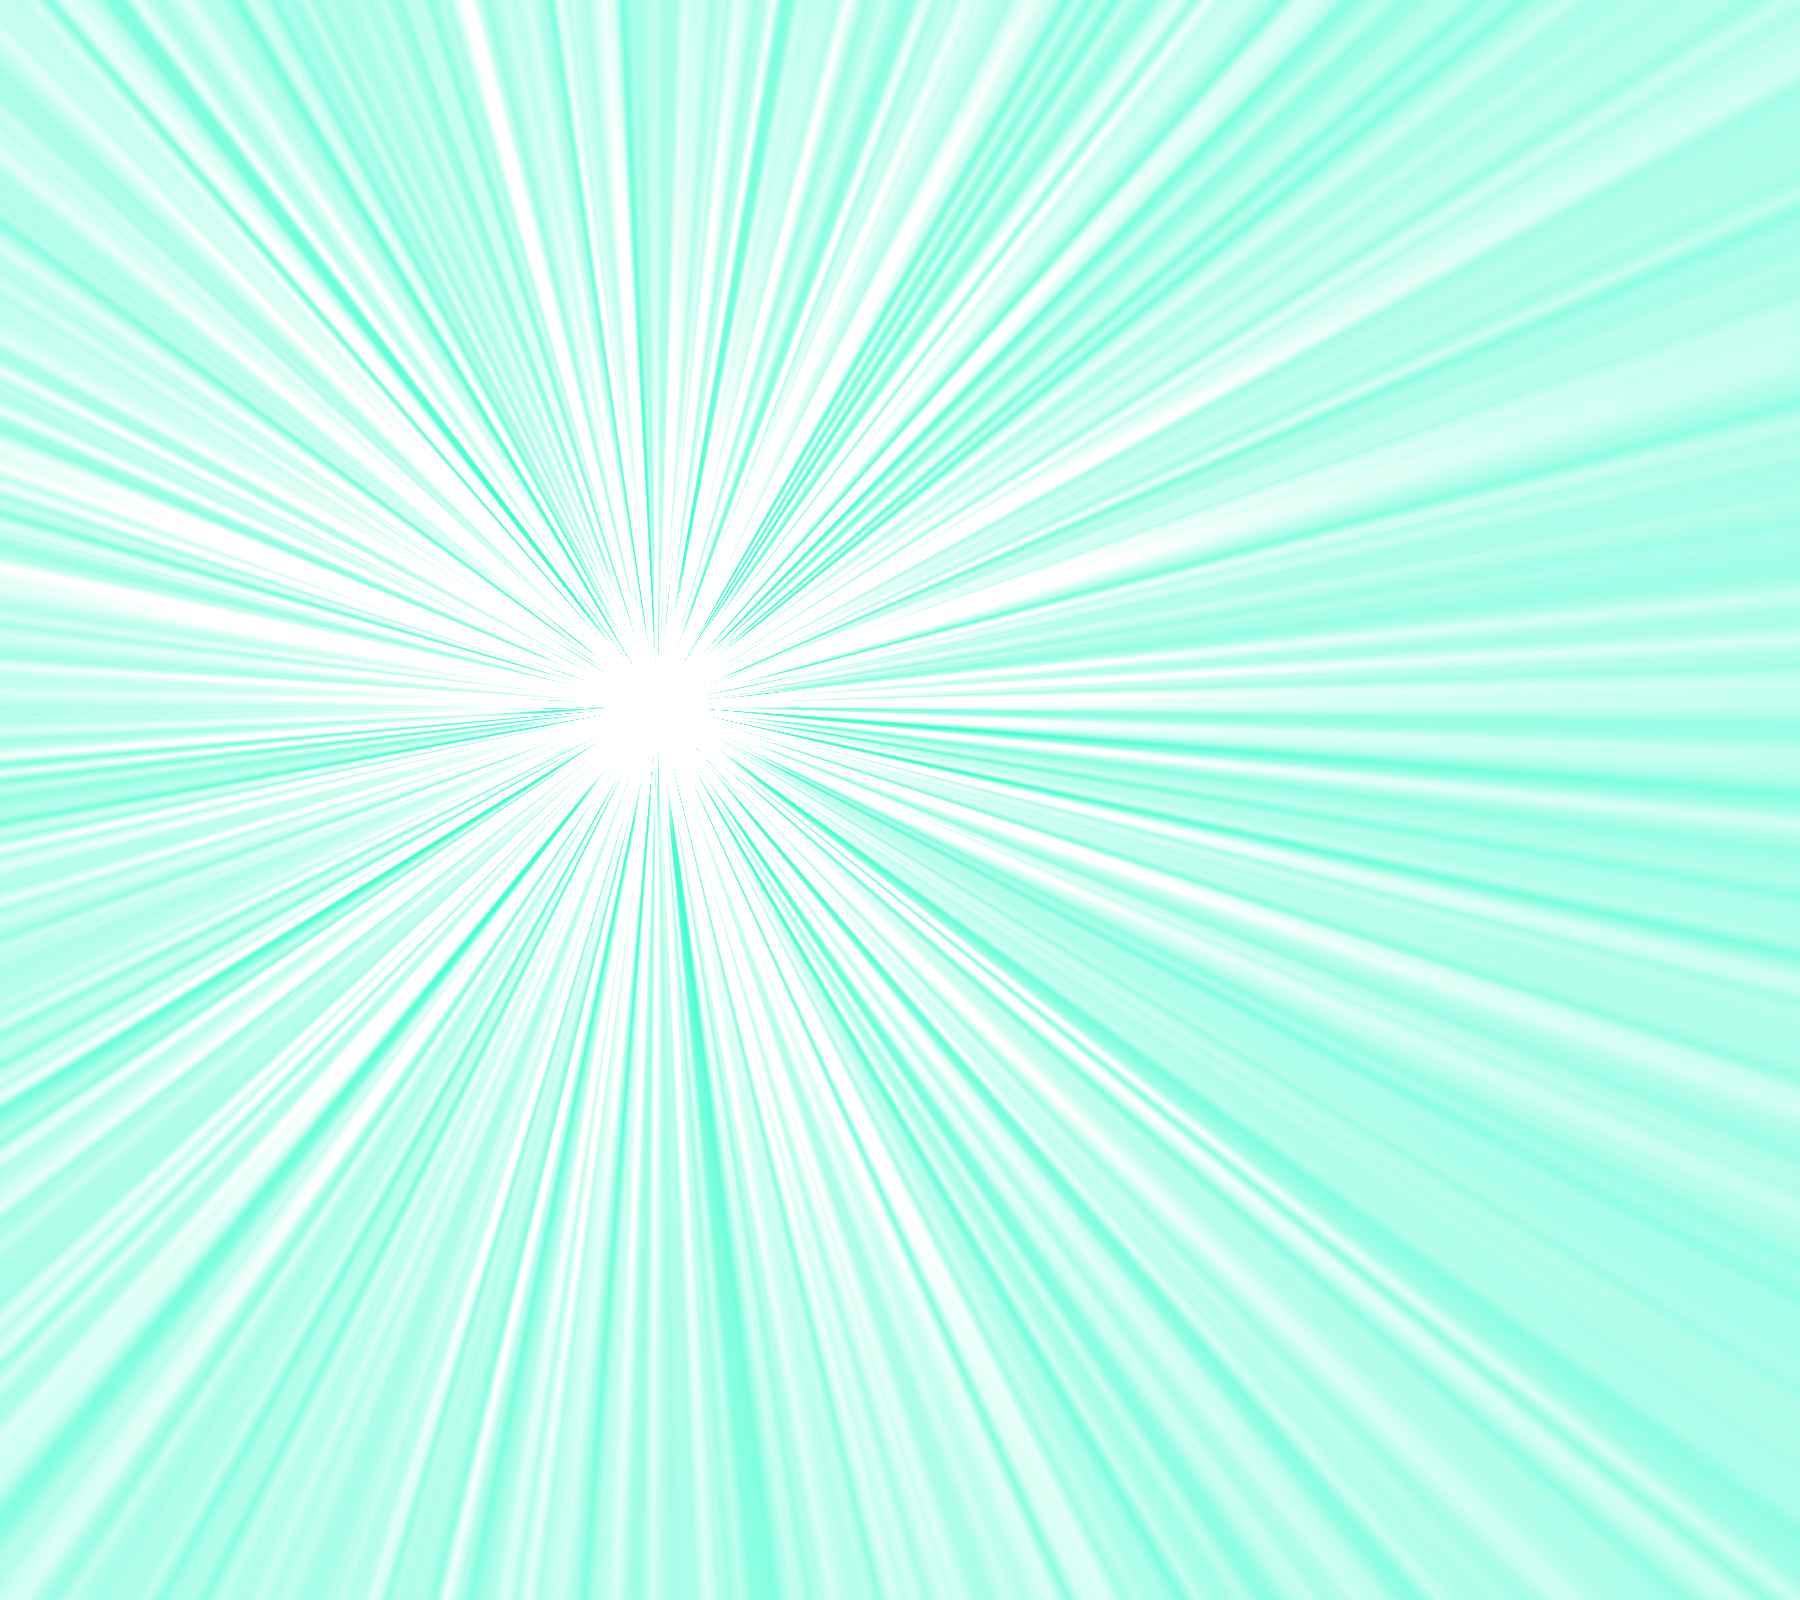 Sea Foam Green Starburst Radiating Lines Background